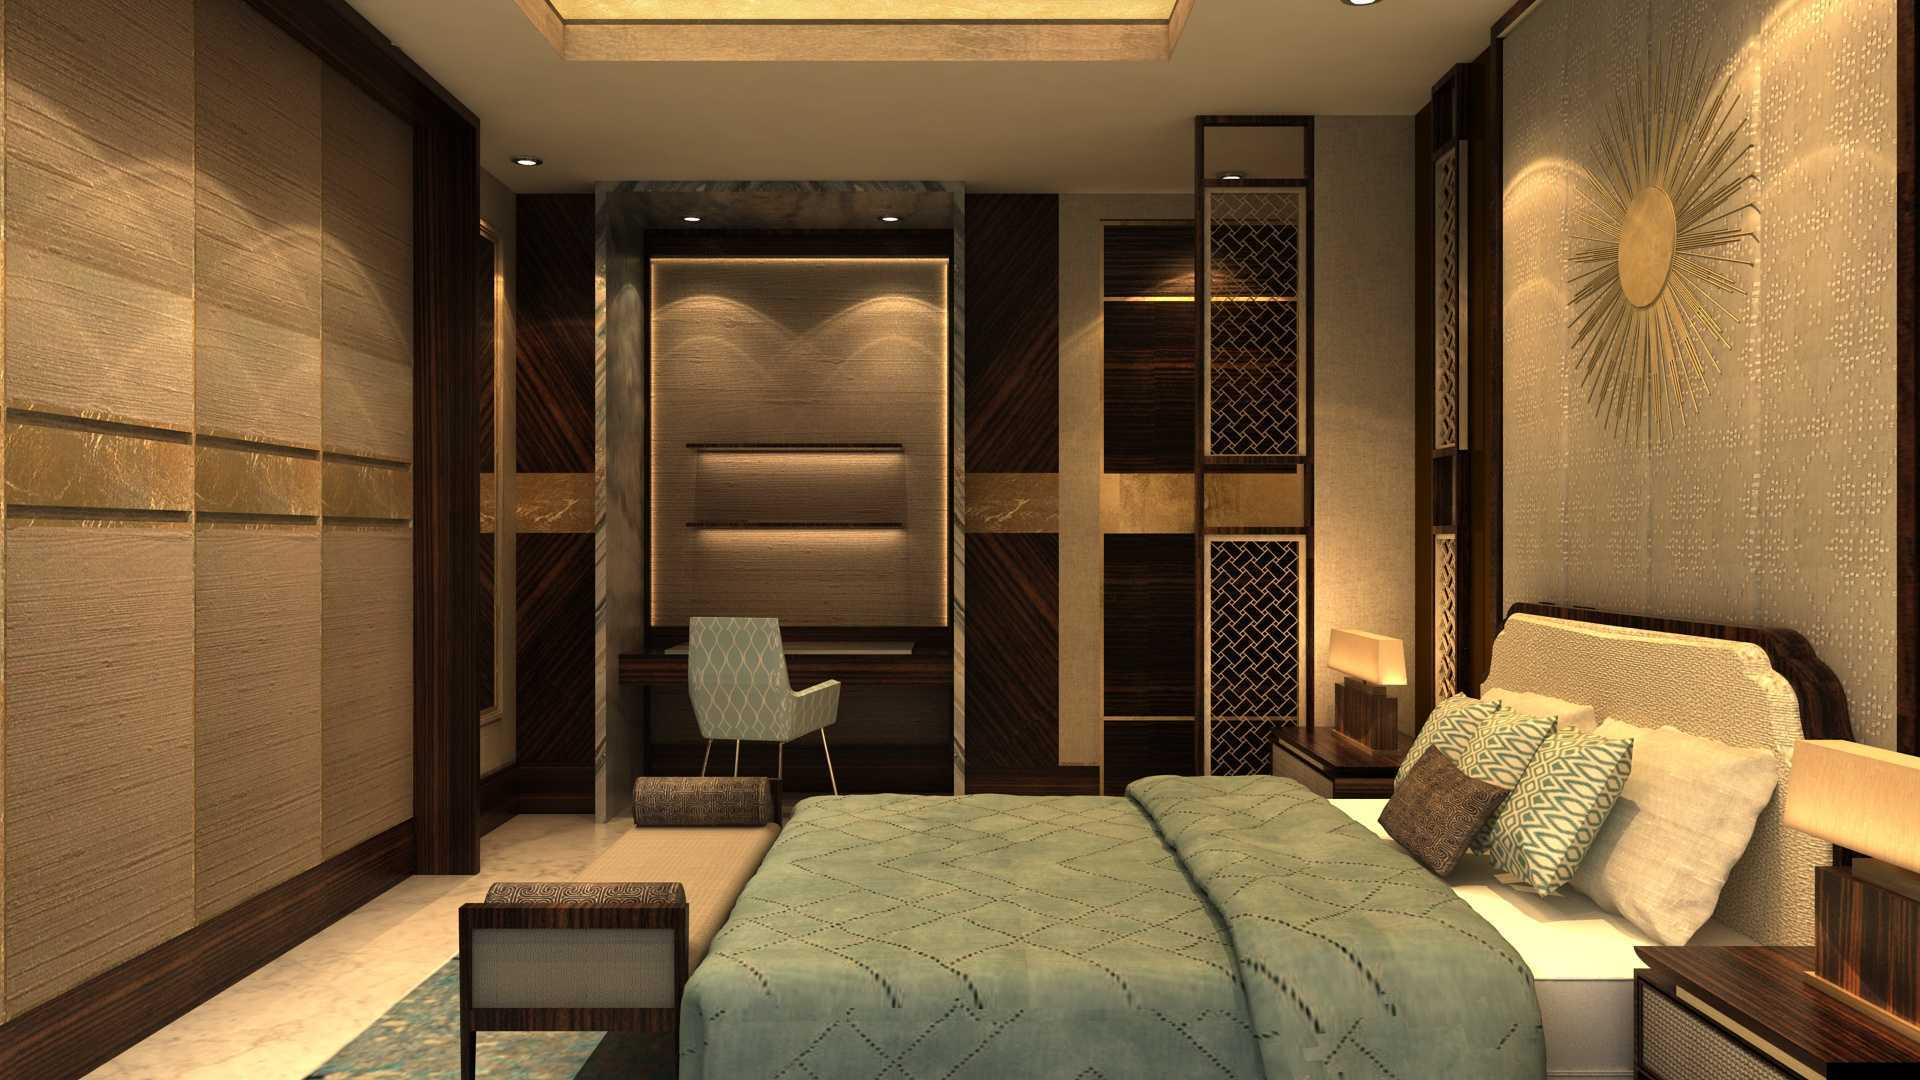 Vin•da•te Mayang Permai Residence Ii - Residential Project (Artist Impression - Construction In Progress) Pantai Indah Kapuk - North Jakarta Pantai Indah Kapuk - North Jakarta Lt Kontemporer  17237